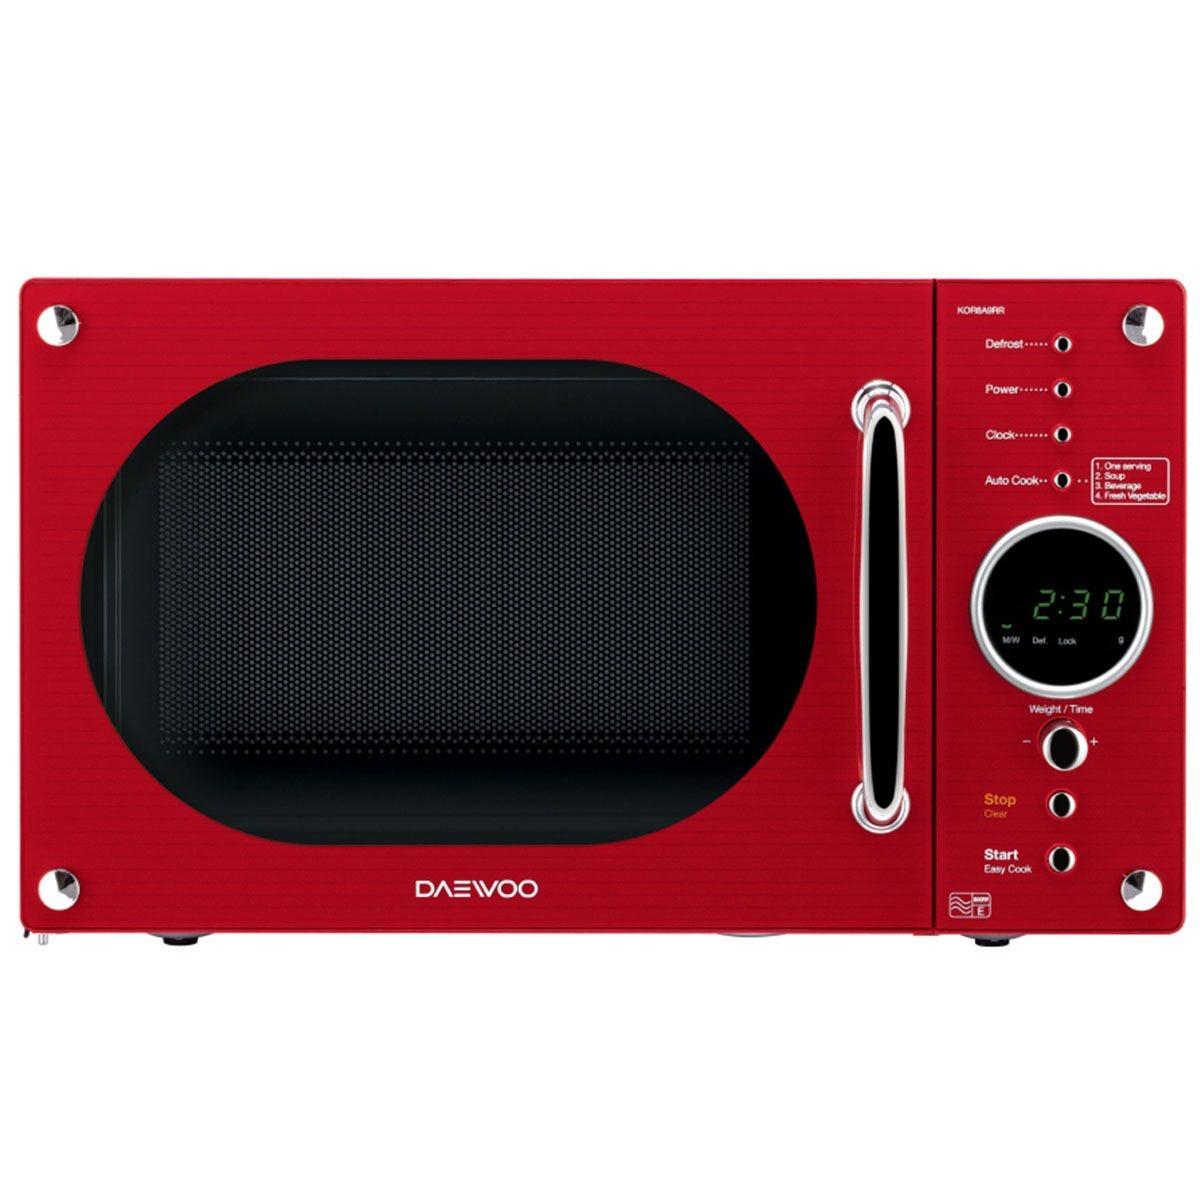 Daewoo Retro Design 800W 23L Manual Microwave - Red